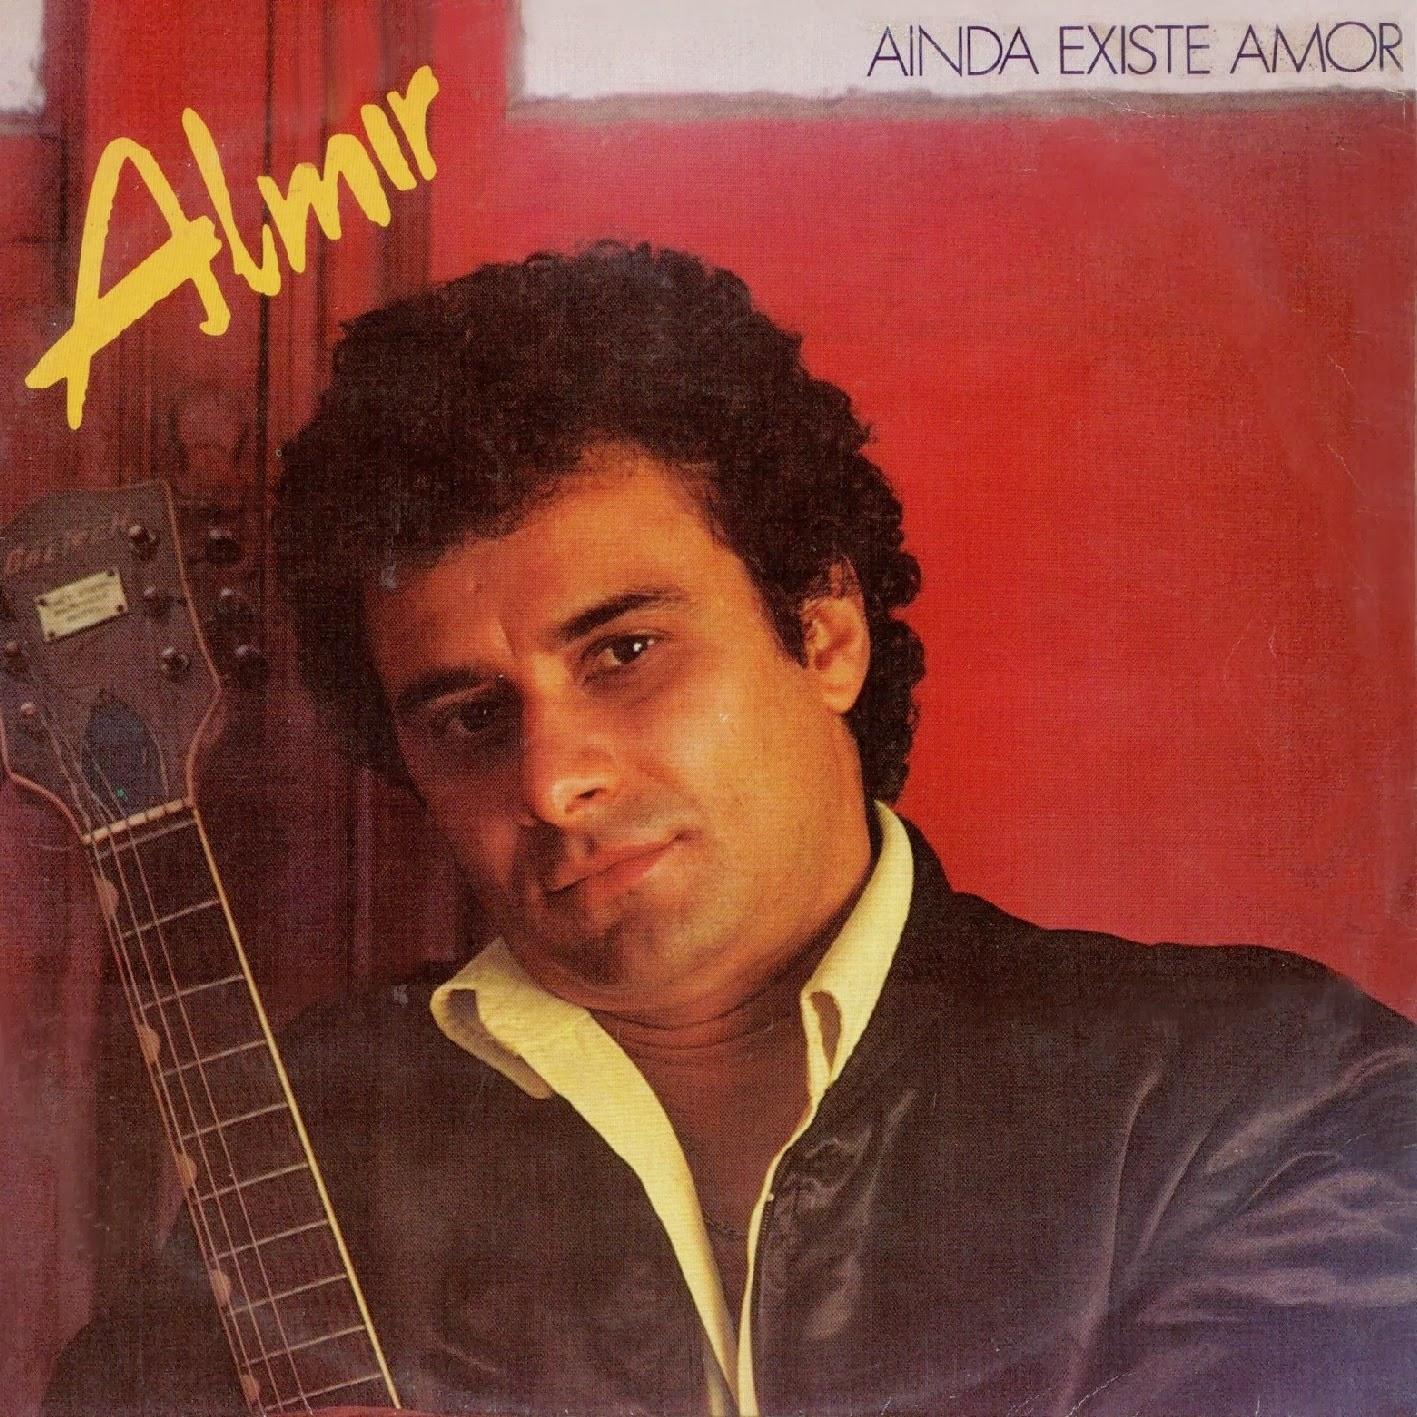 Almir Bezerra - Ainda Existe Amor - 1981 - Brega Blog